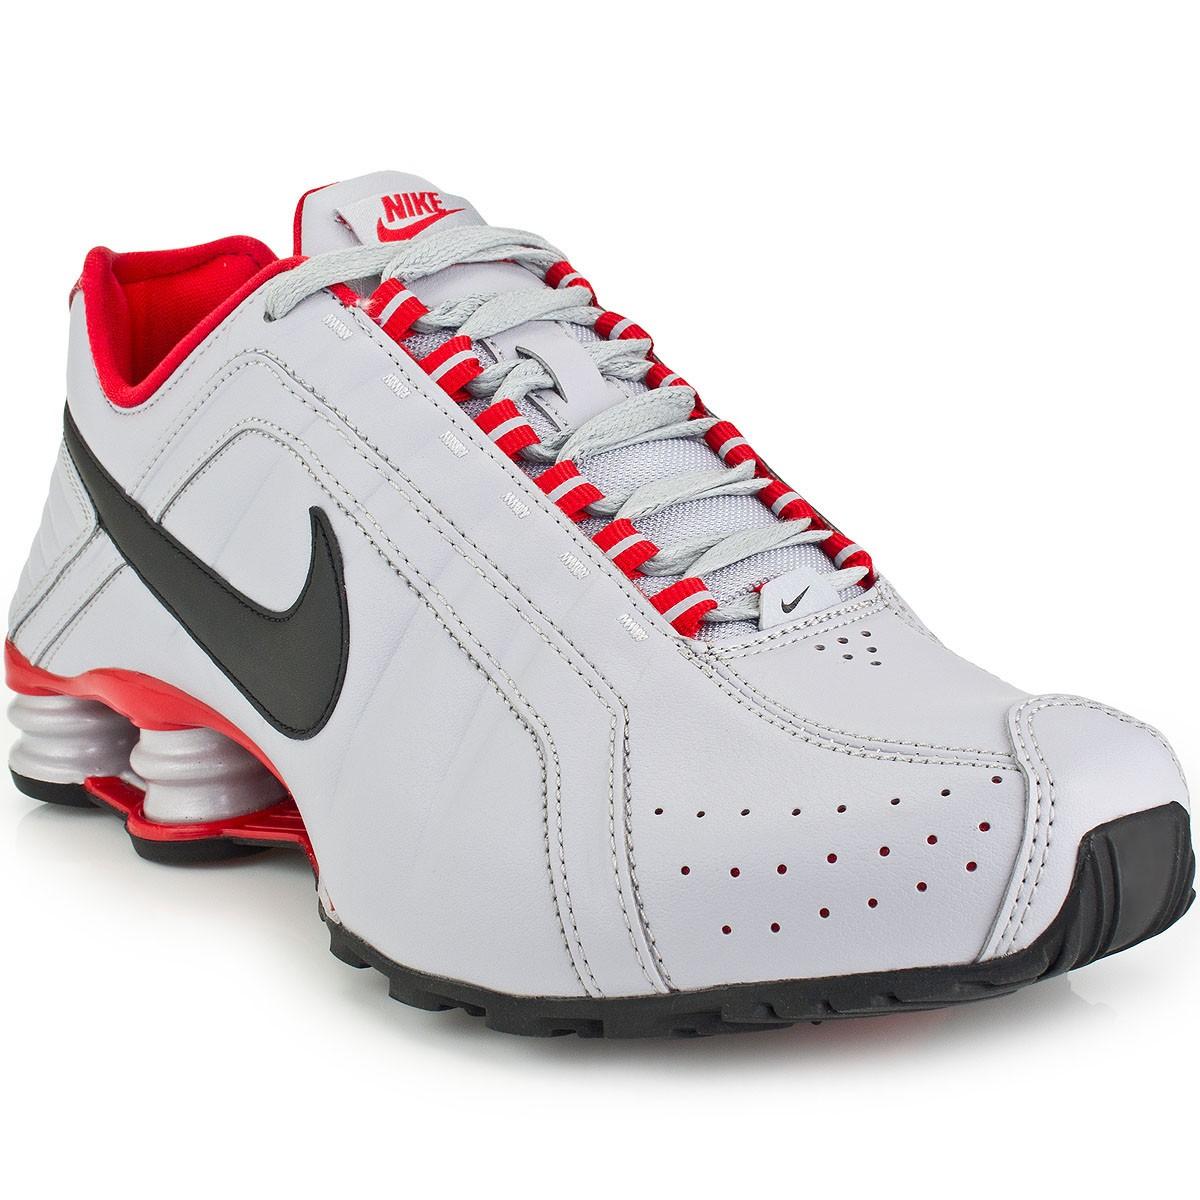 028ca4d9d72 Tênis Nike Shox Junior 454340